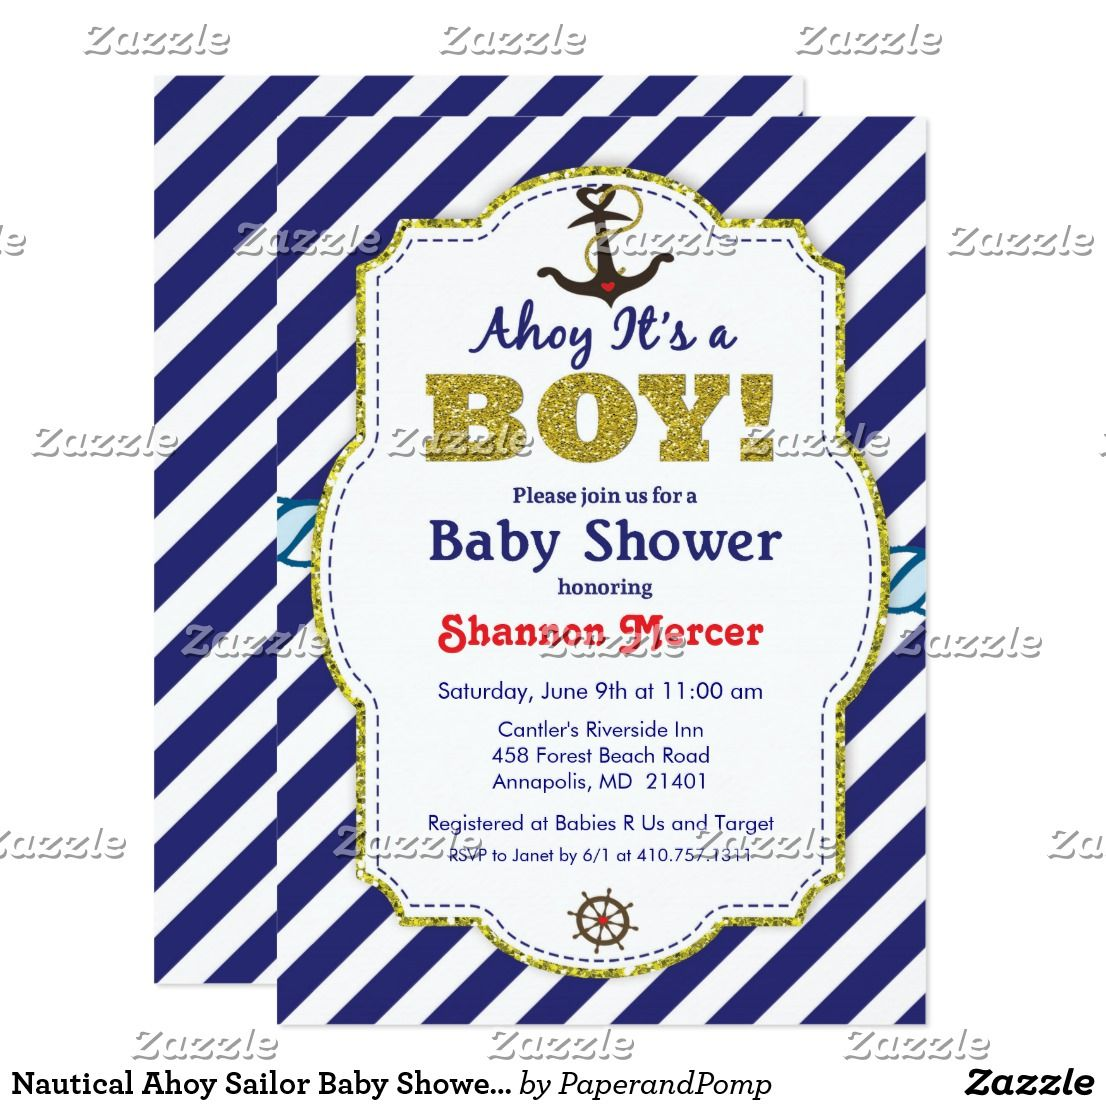 Nautical Ahoy Sailor Baby Shower Invitation | Sailor baby showers ...